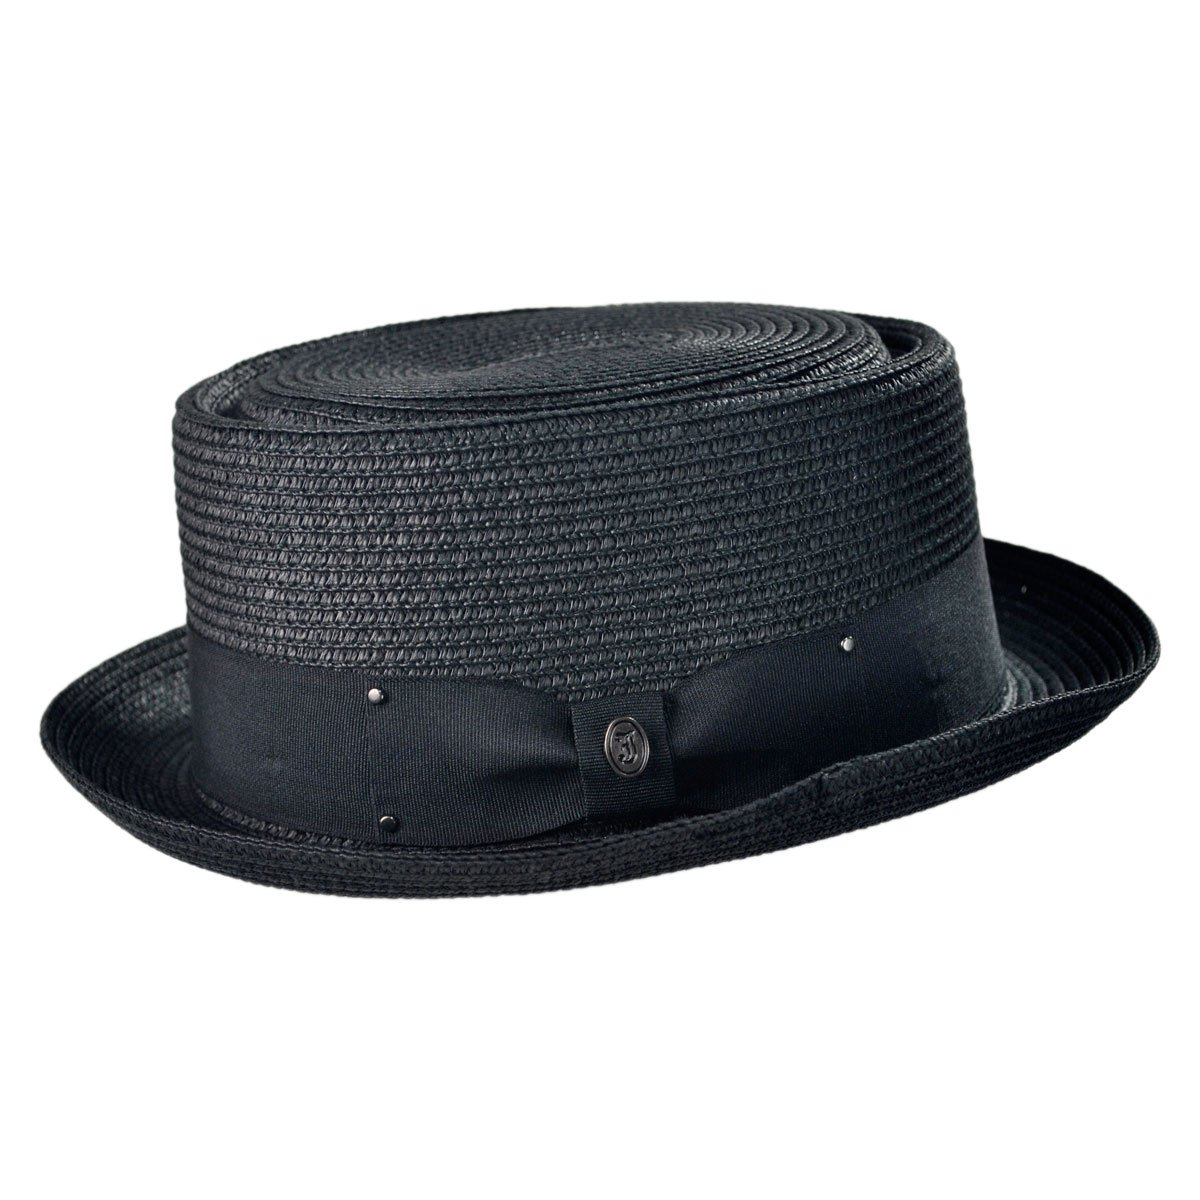 ecac1250b8f526 Jaxon Hats Toyo Braid Pork Pie Hat at Amazon Men's Clothing store: